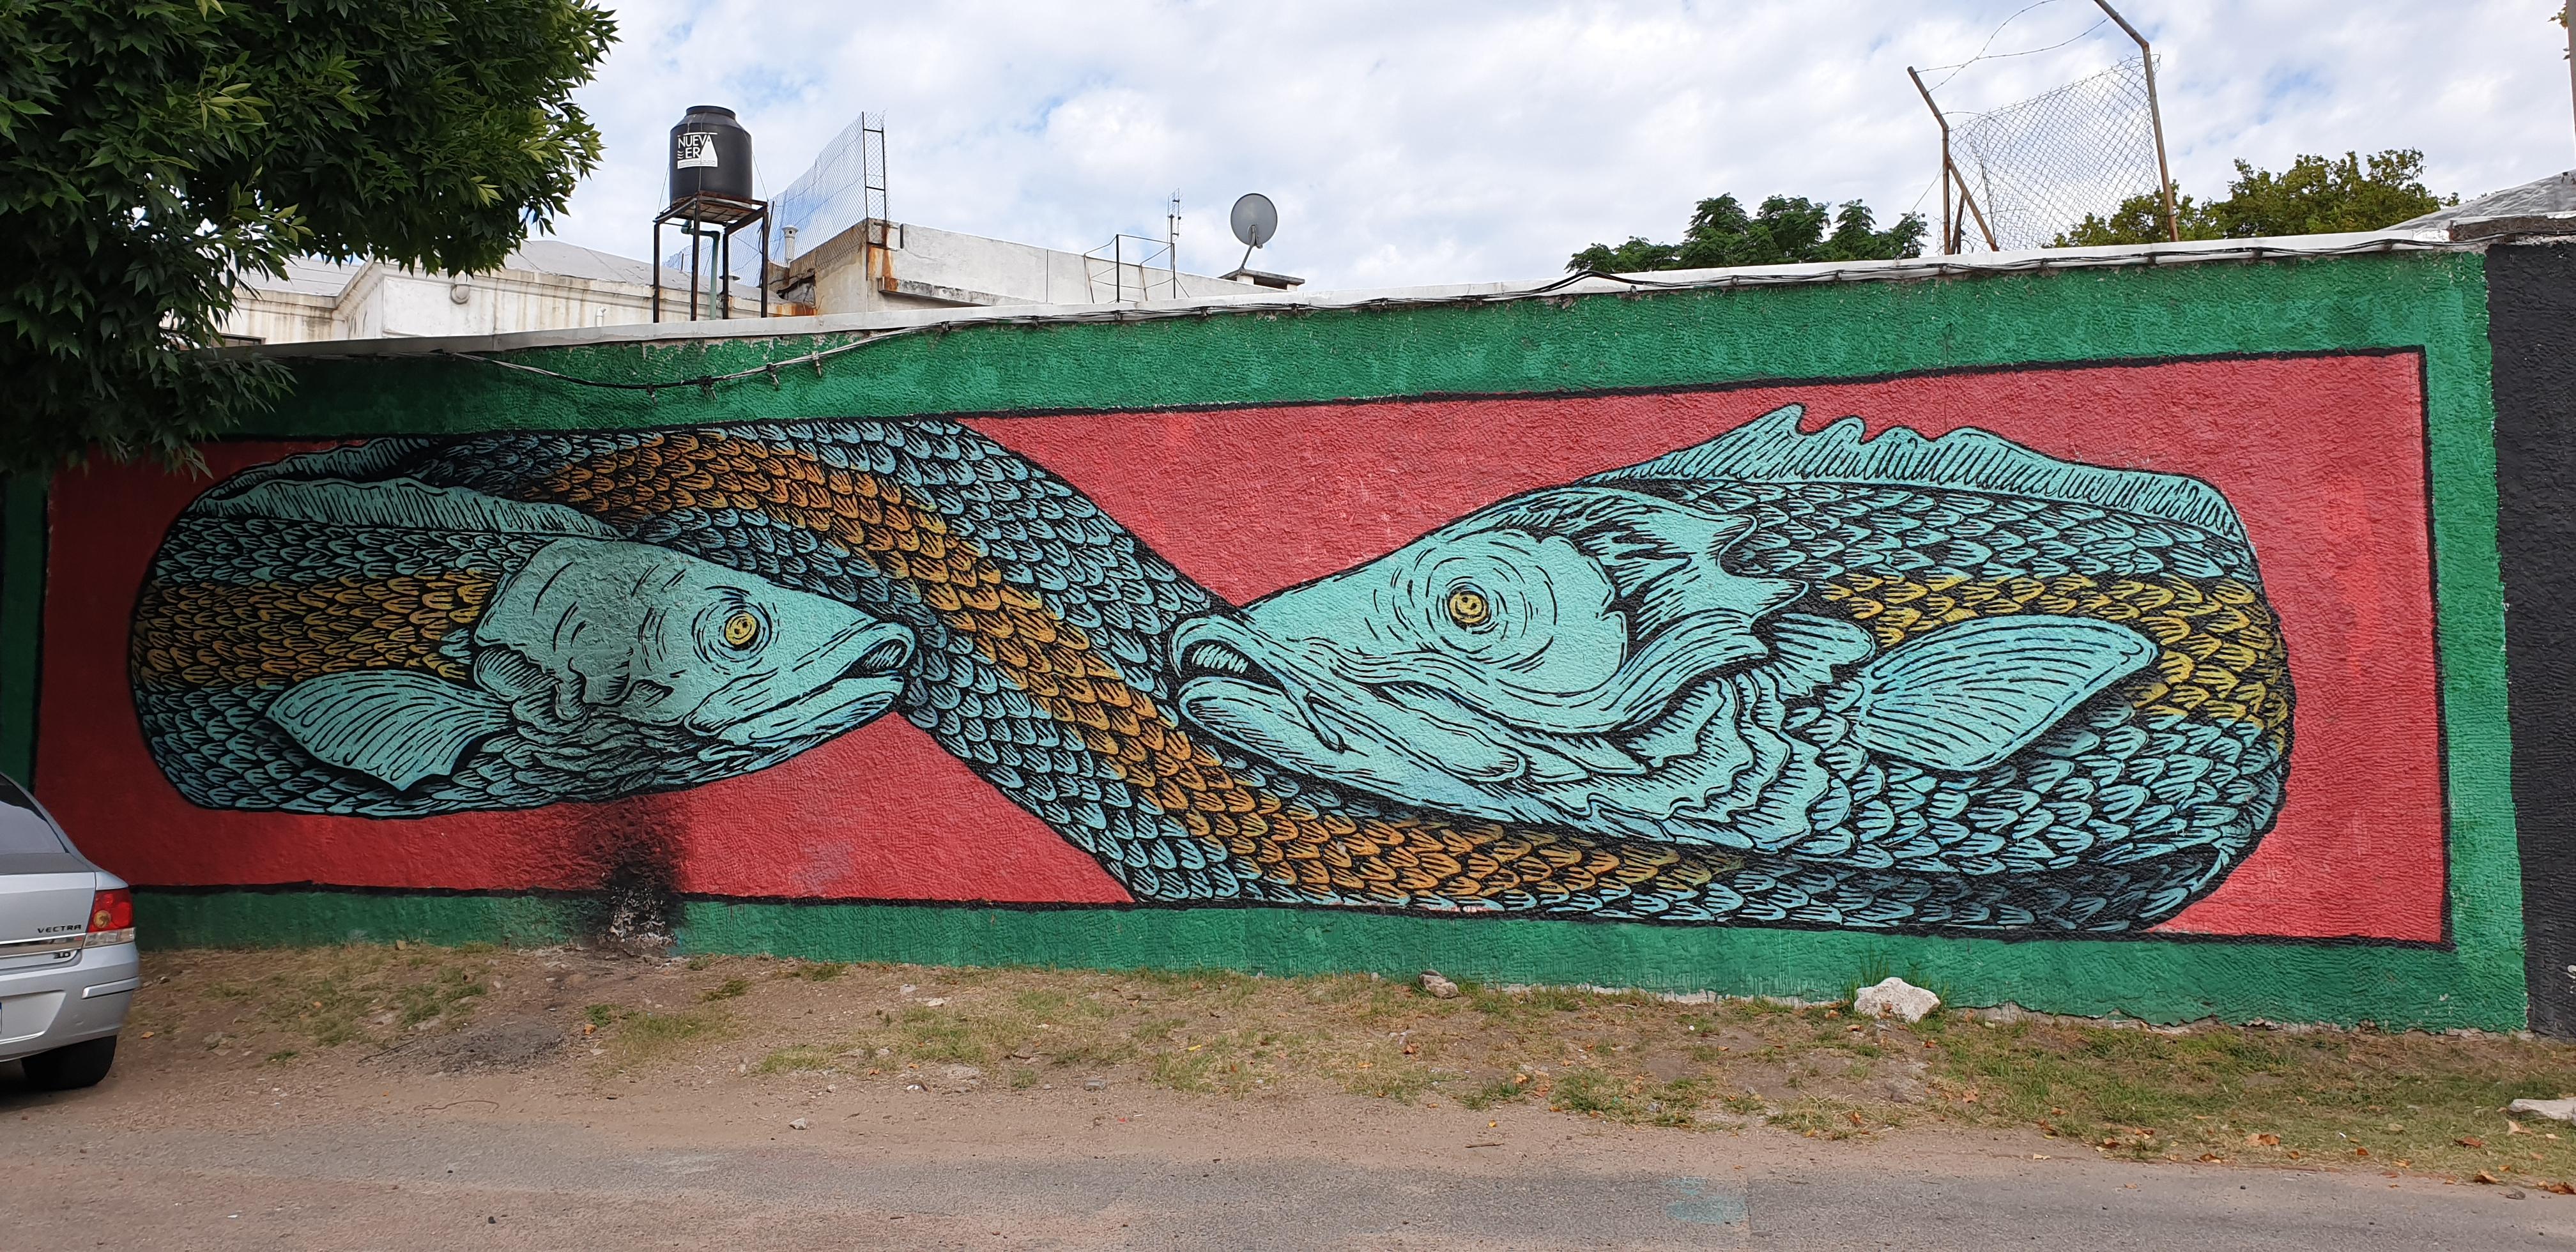 Mur réalisé par JUAN - Montevideo - Uruguay 2020 - ©nofakeinmynews.com